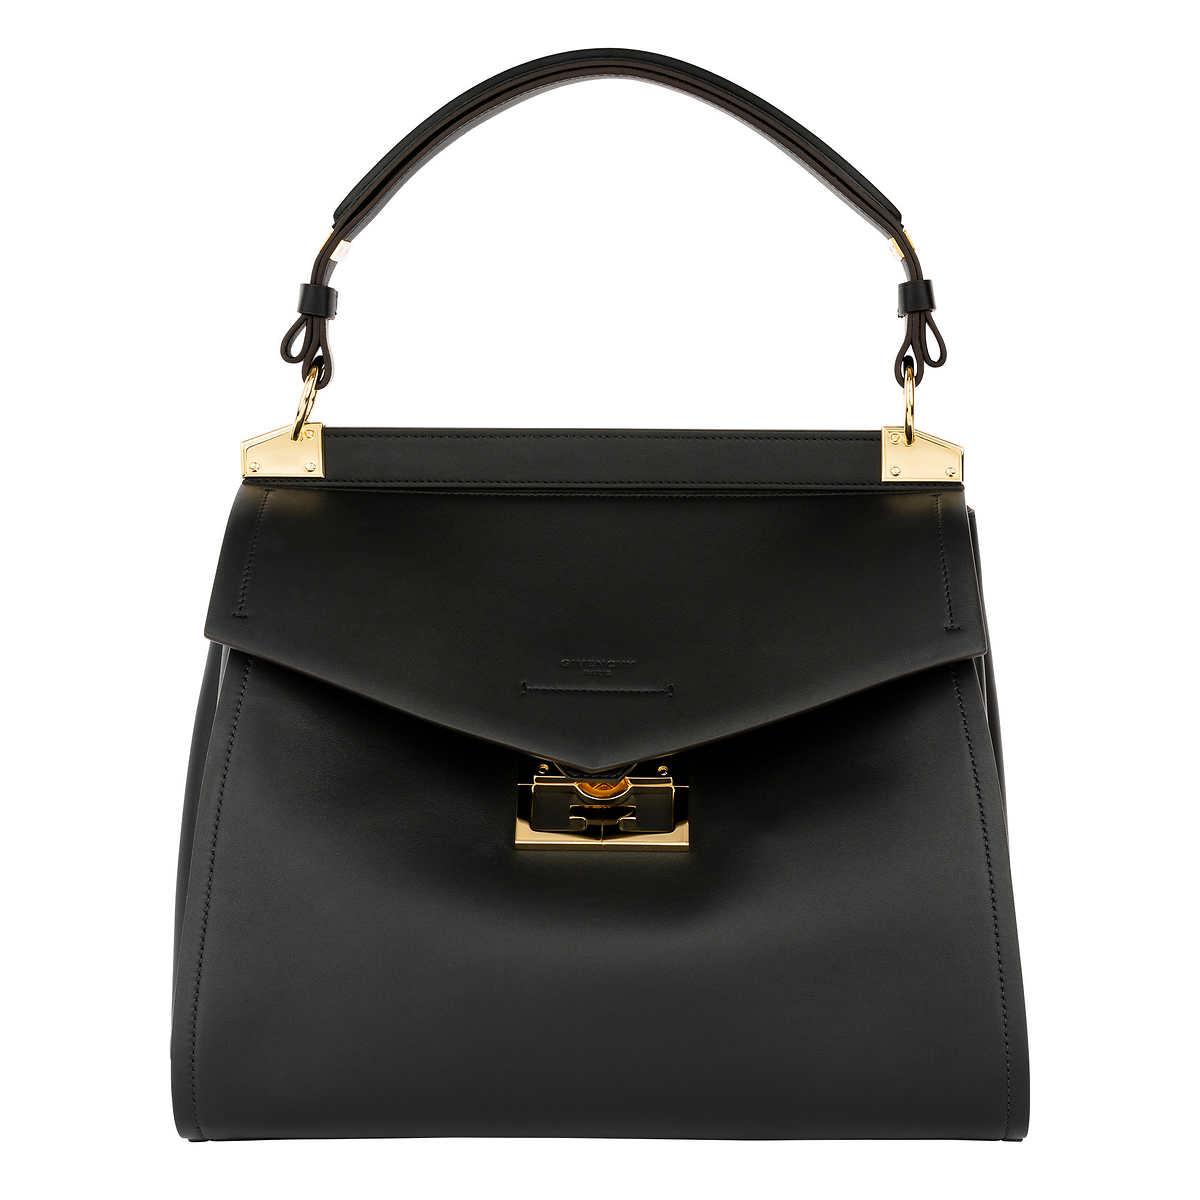 Givenchy Medium Mystic Bag, Black